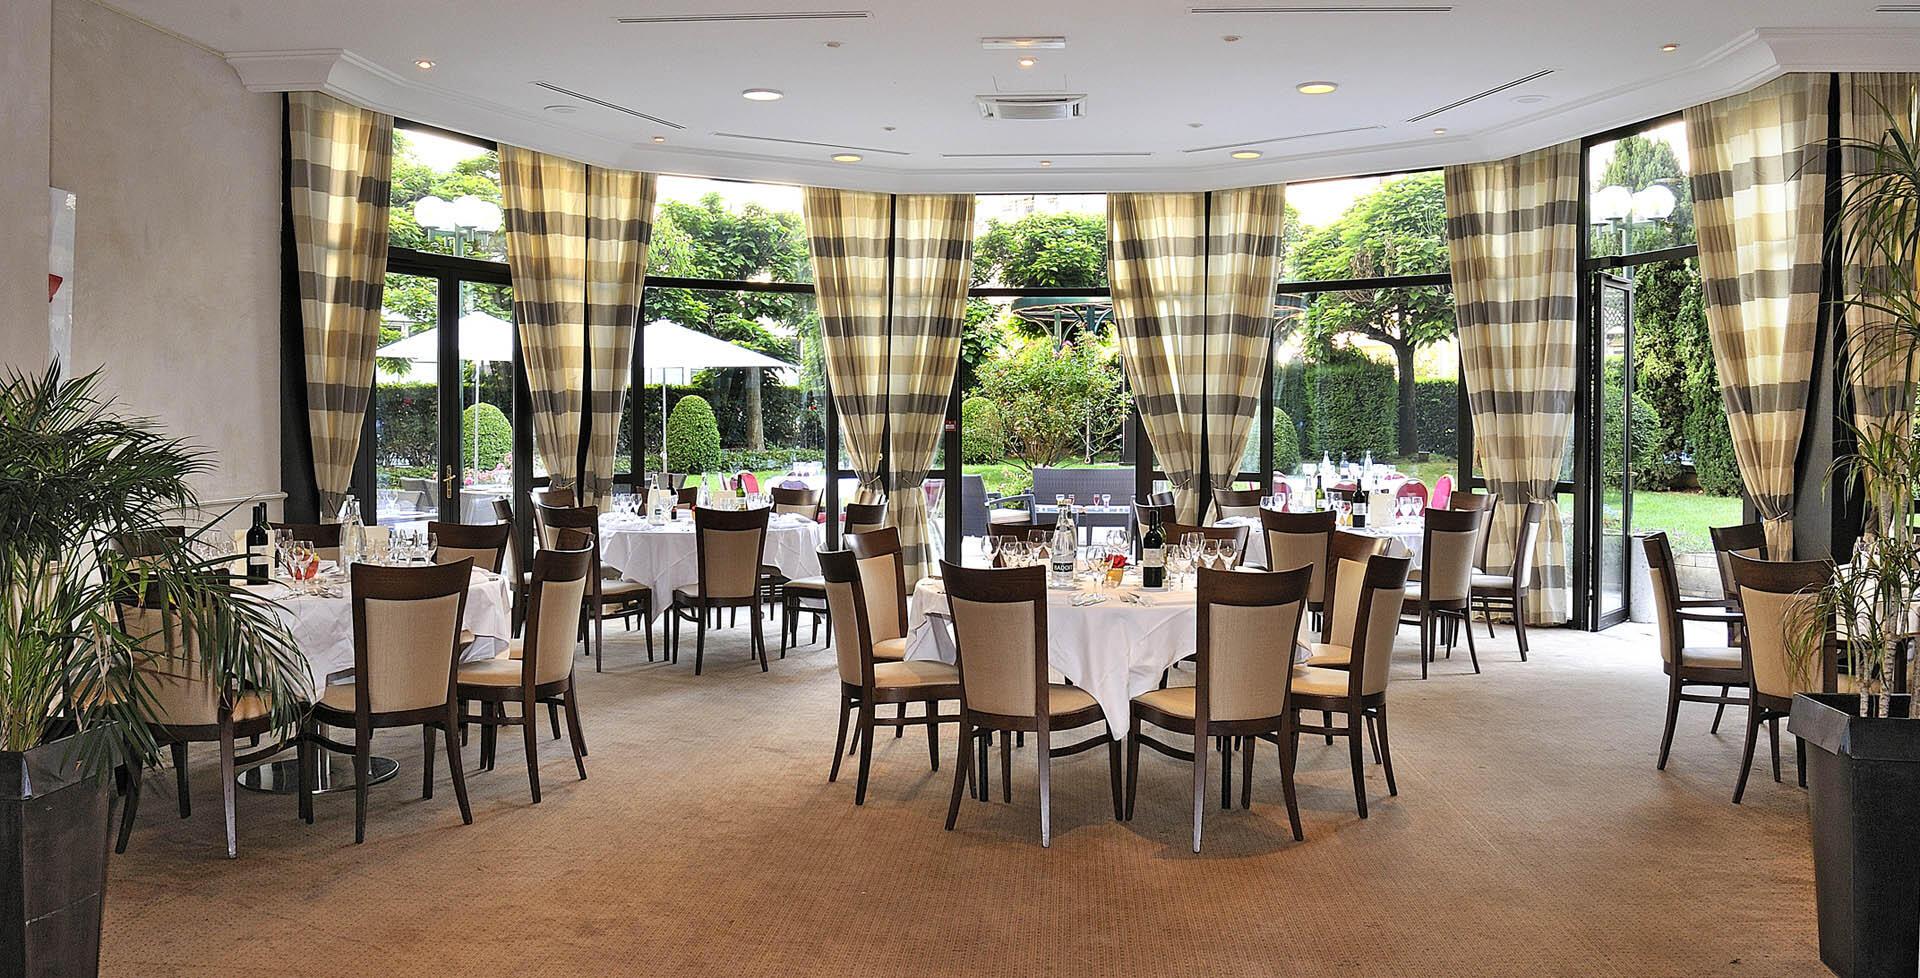 Salle de banquet Roseraie au Warwick Astrid Lyon